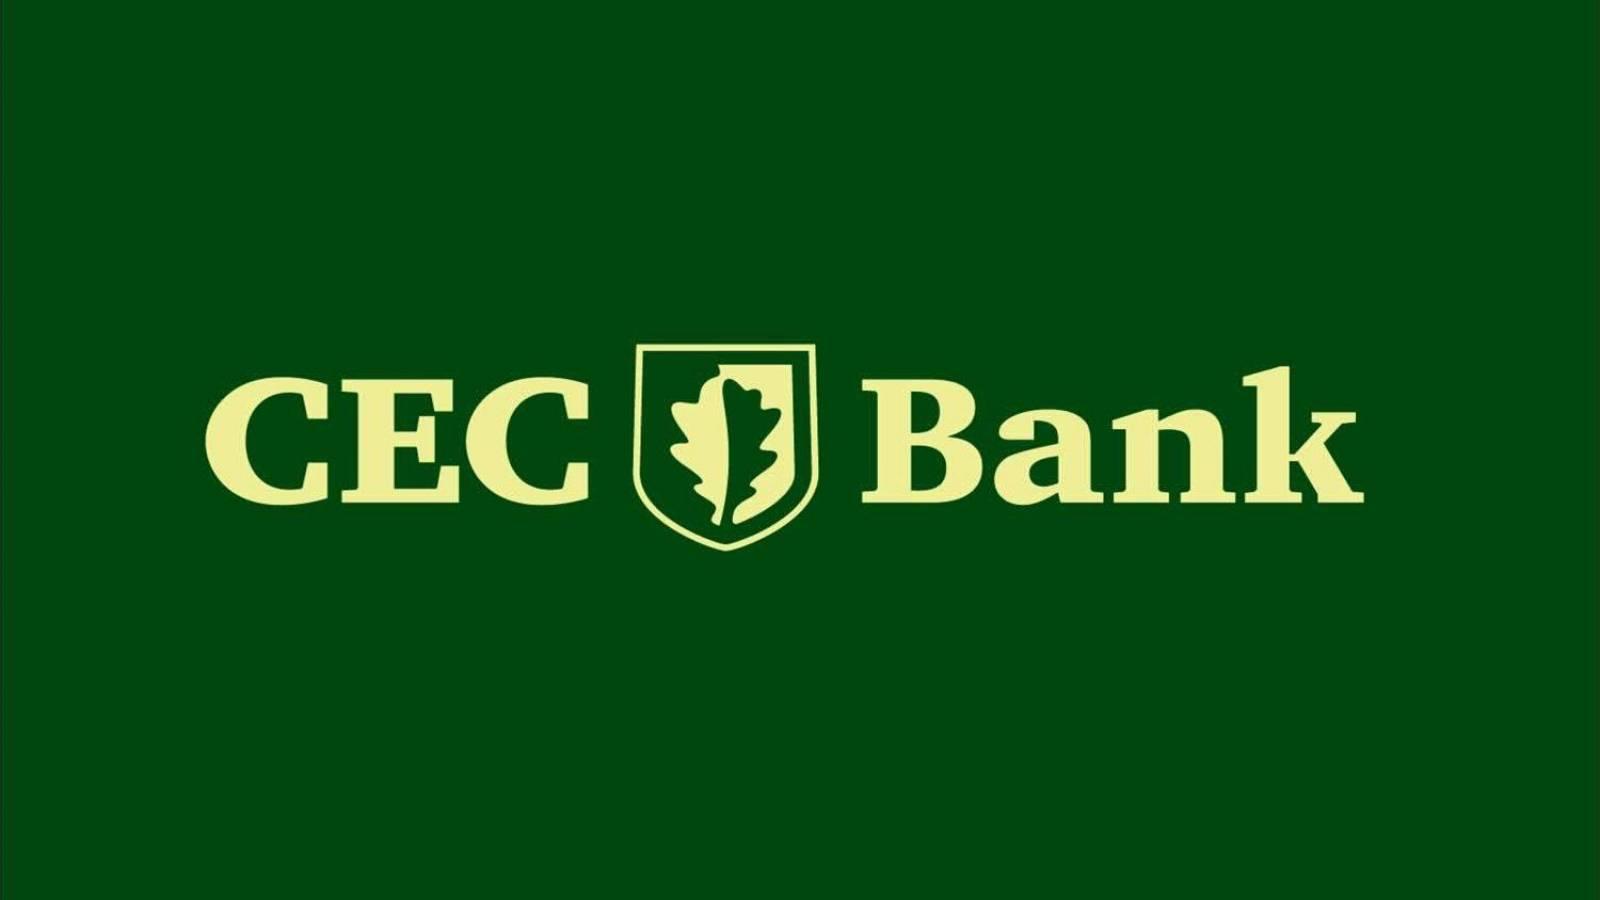 CEC Bank controlare